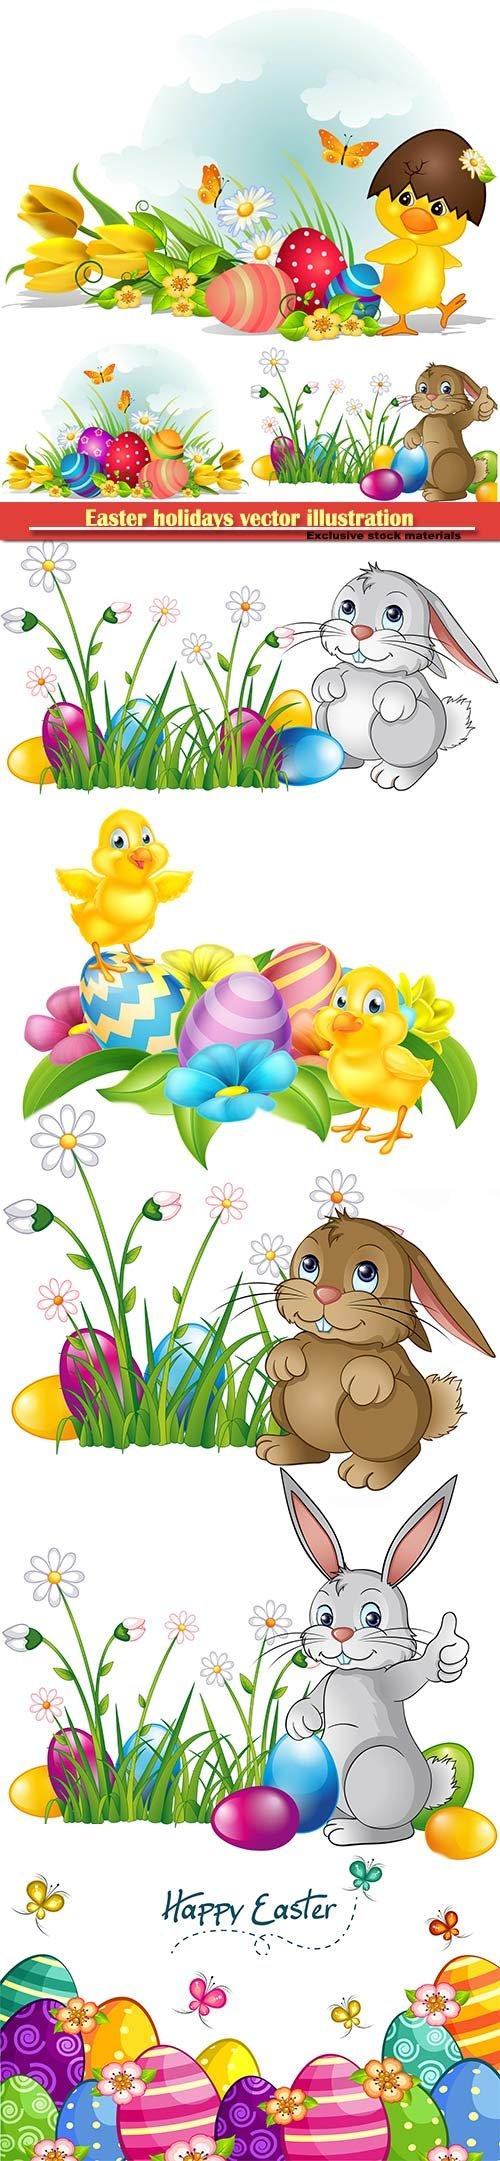 Easter holidays vector illustration # 5